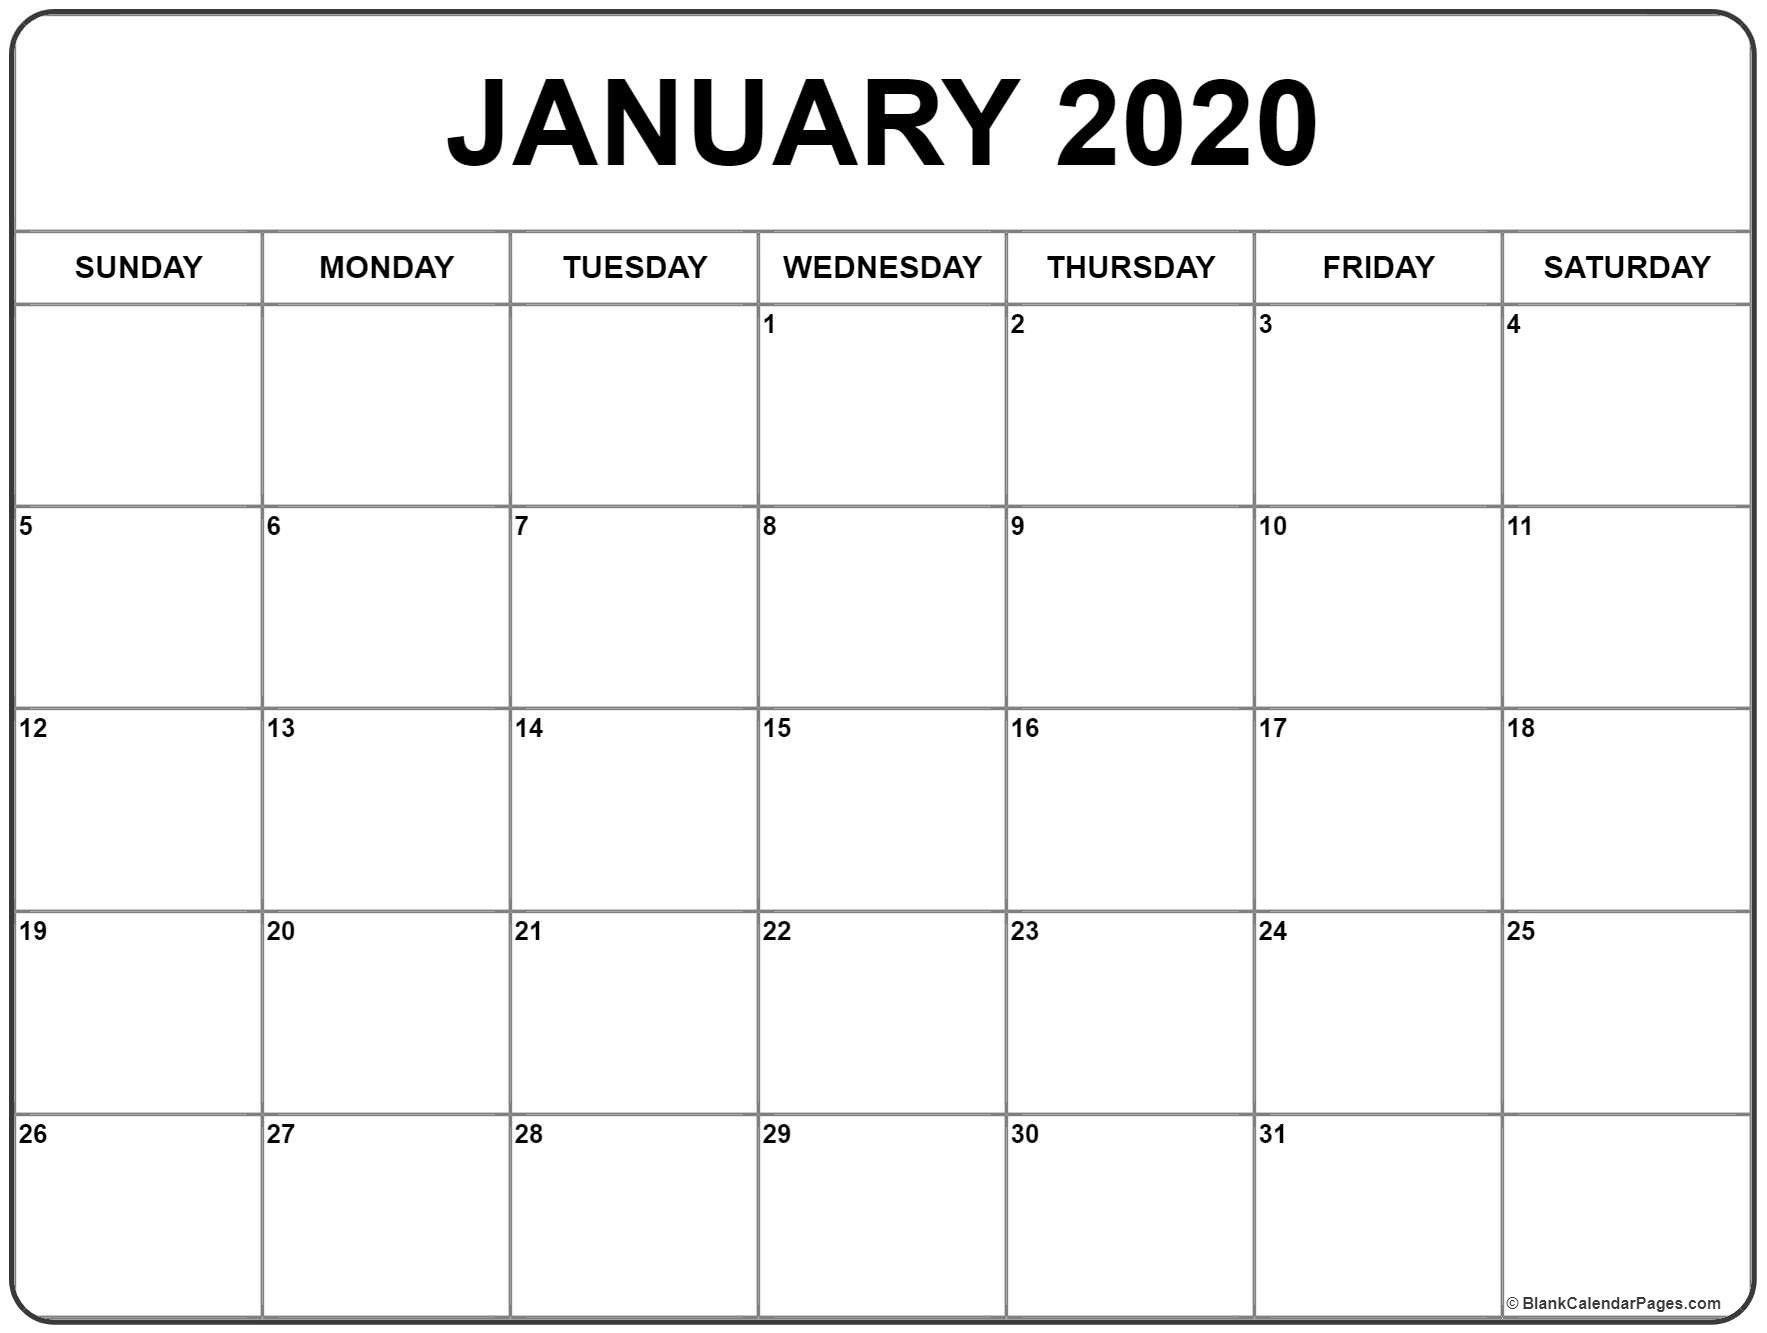 January 2020 Calendar 56 Templates Of 2020 Printable January inside Blank Calendar 2020 Printable Monthly